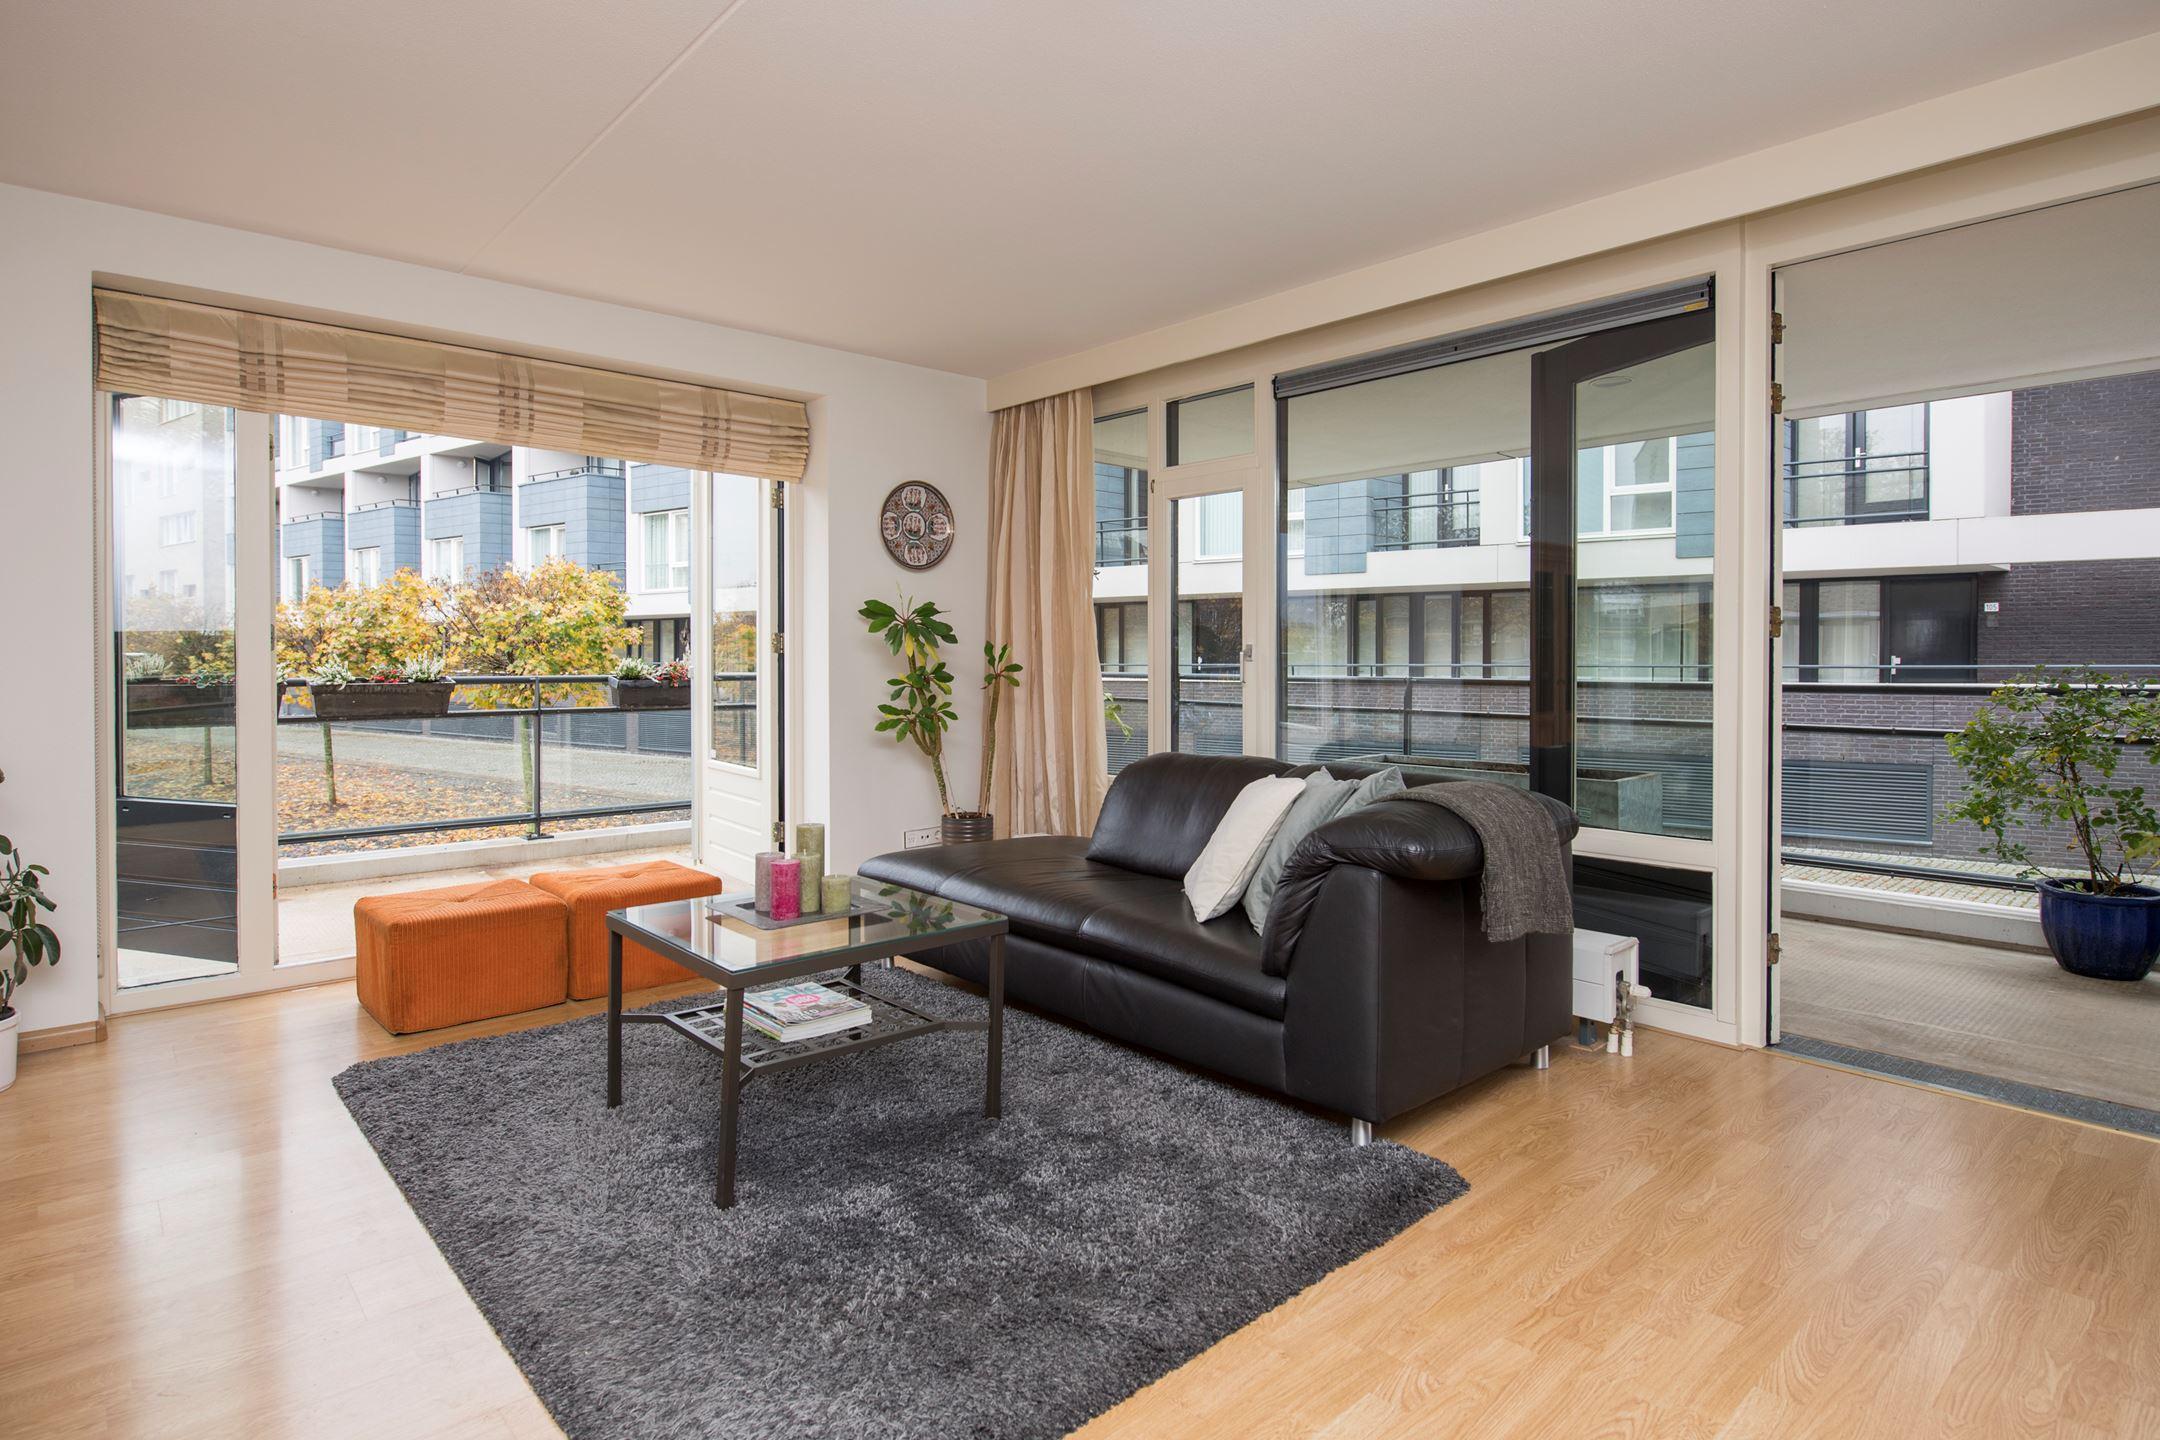 Verkocht gotenpark 155 5037 sn tilburg funda - Modern volwassen kamer behang ...